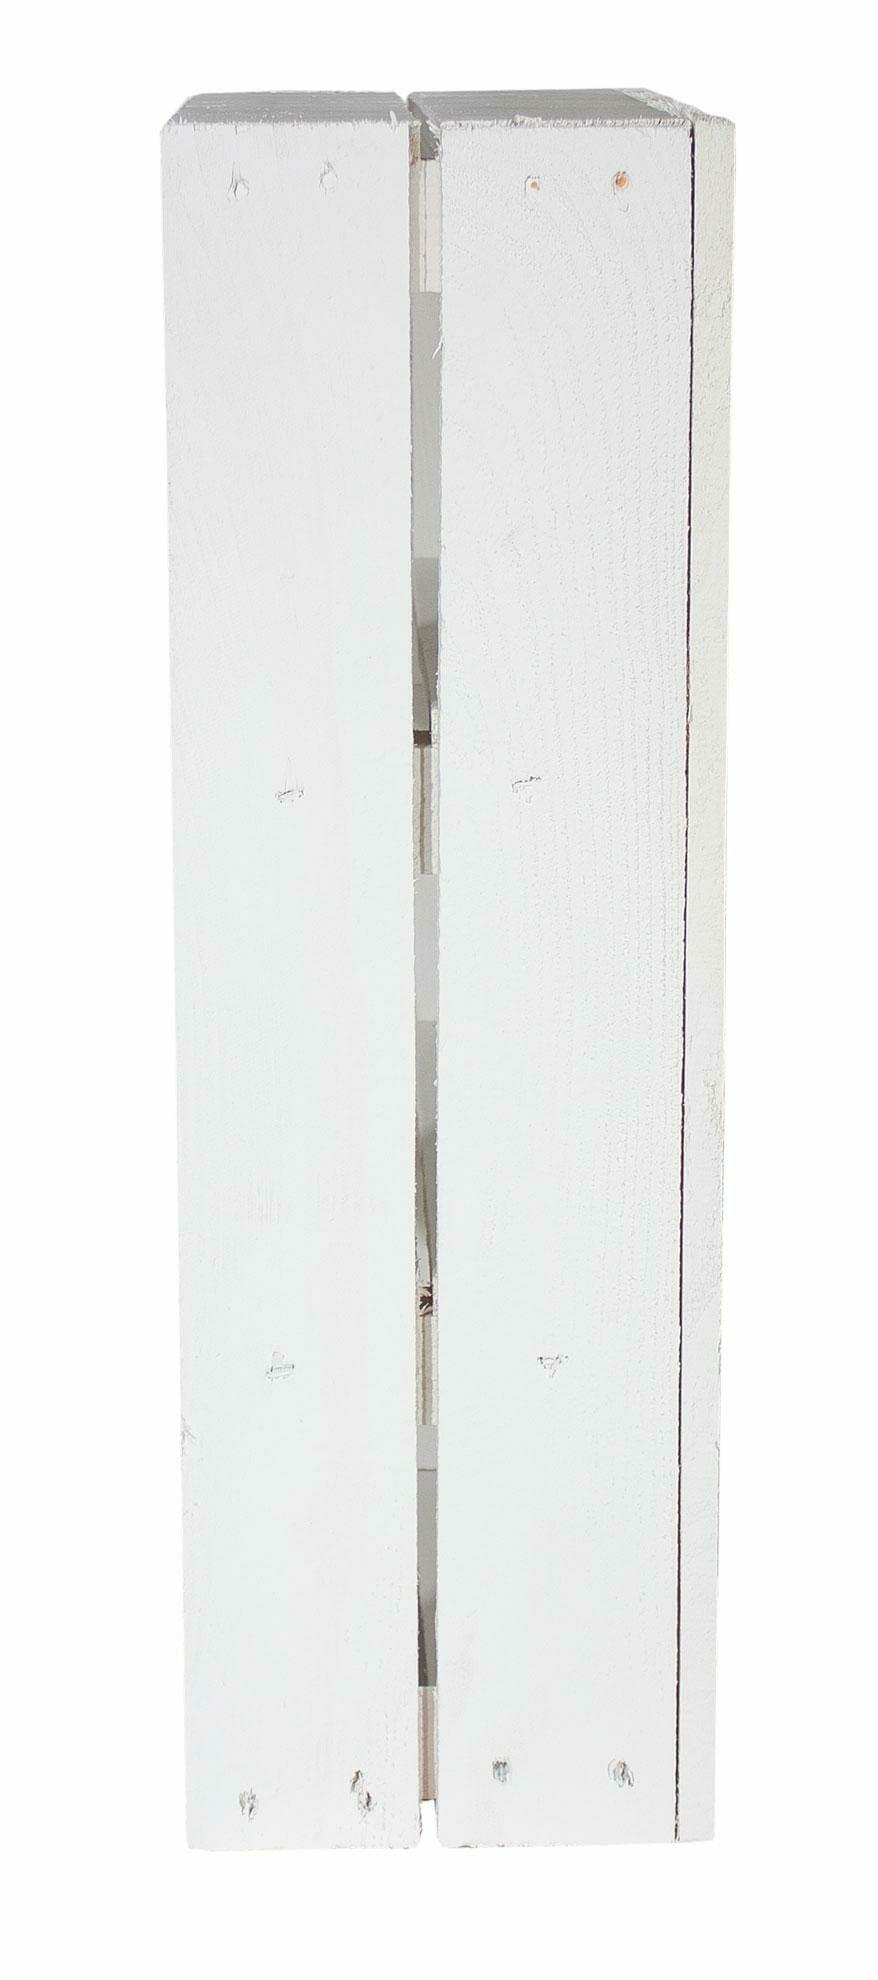 wei e flache regalkiste mit 3 f chern 50x40x16cm. Black Bedroom Furniture Sets. Home Design Ideas